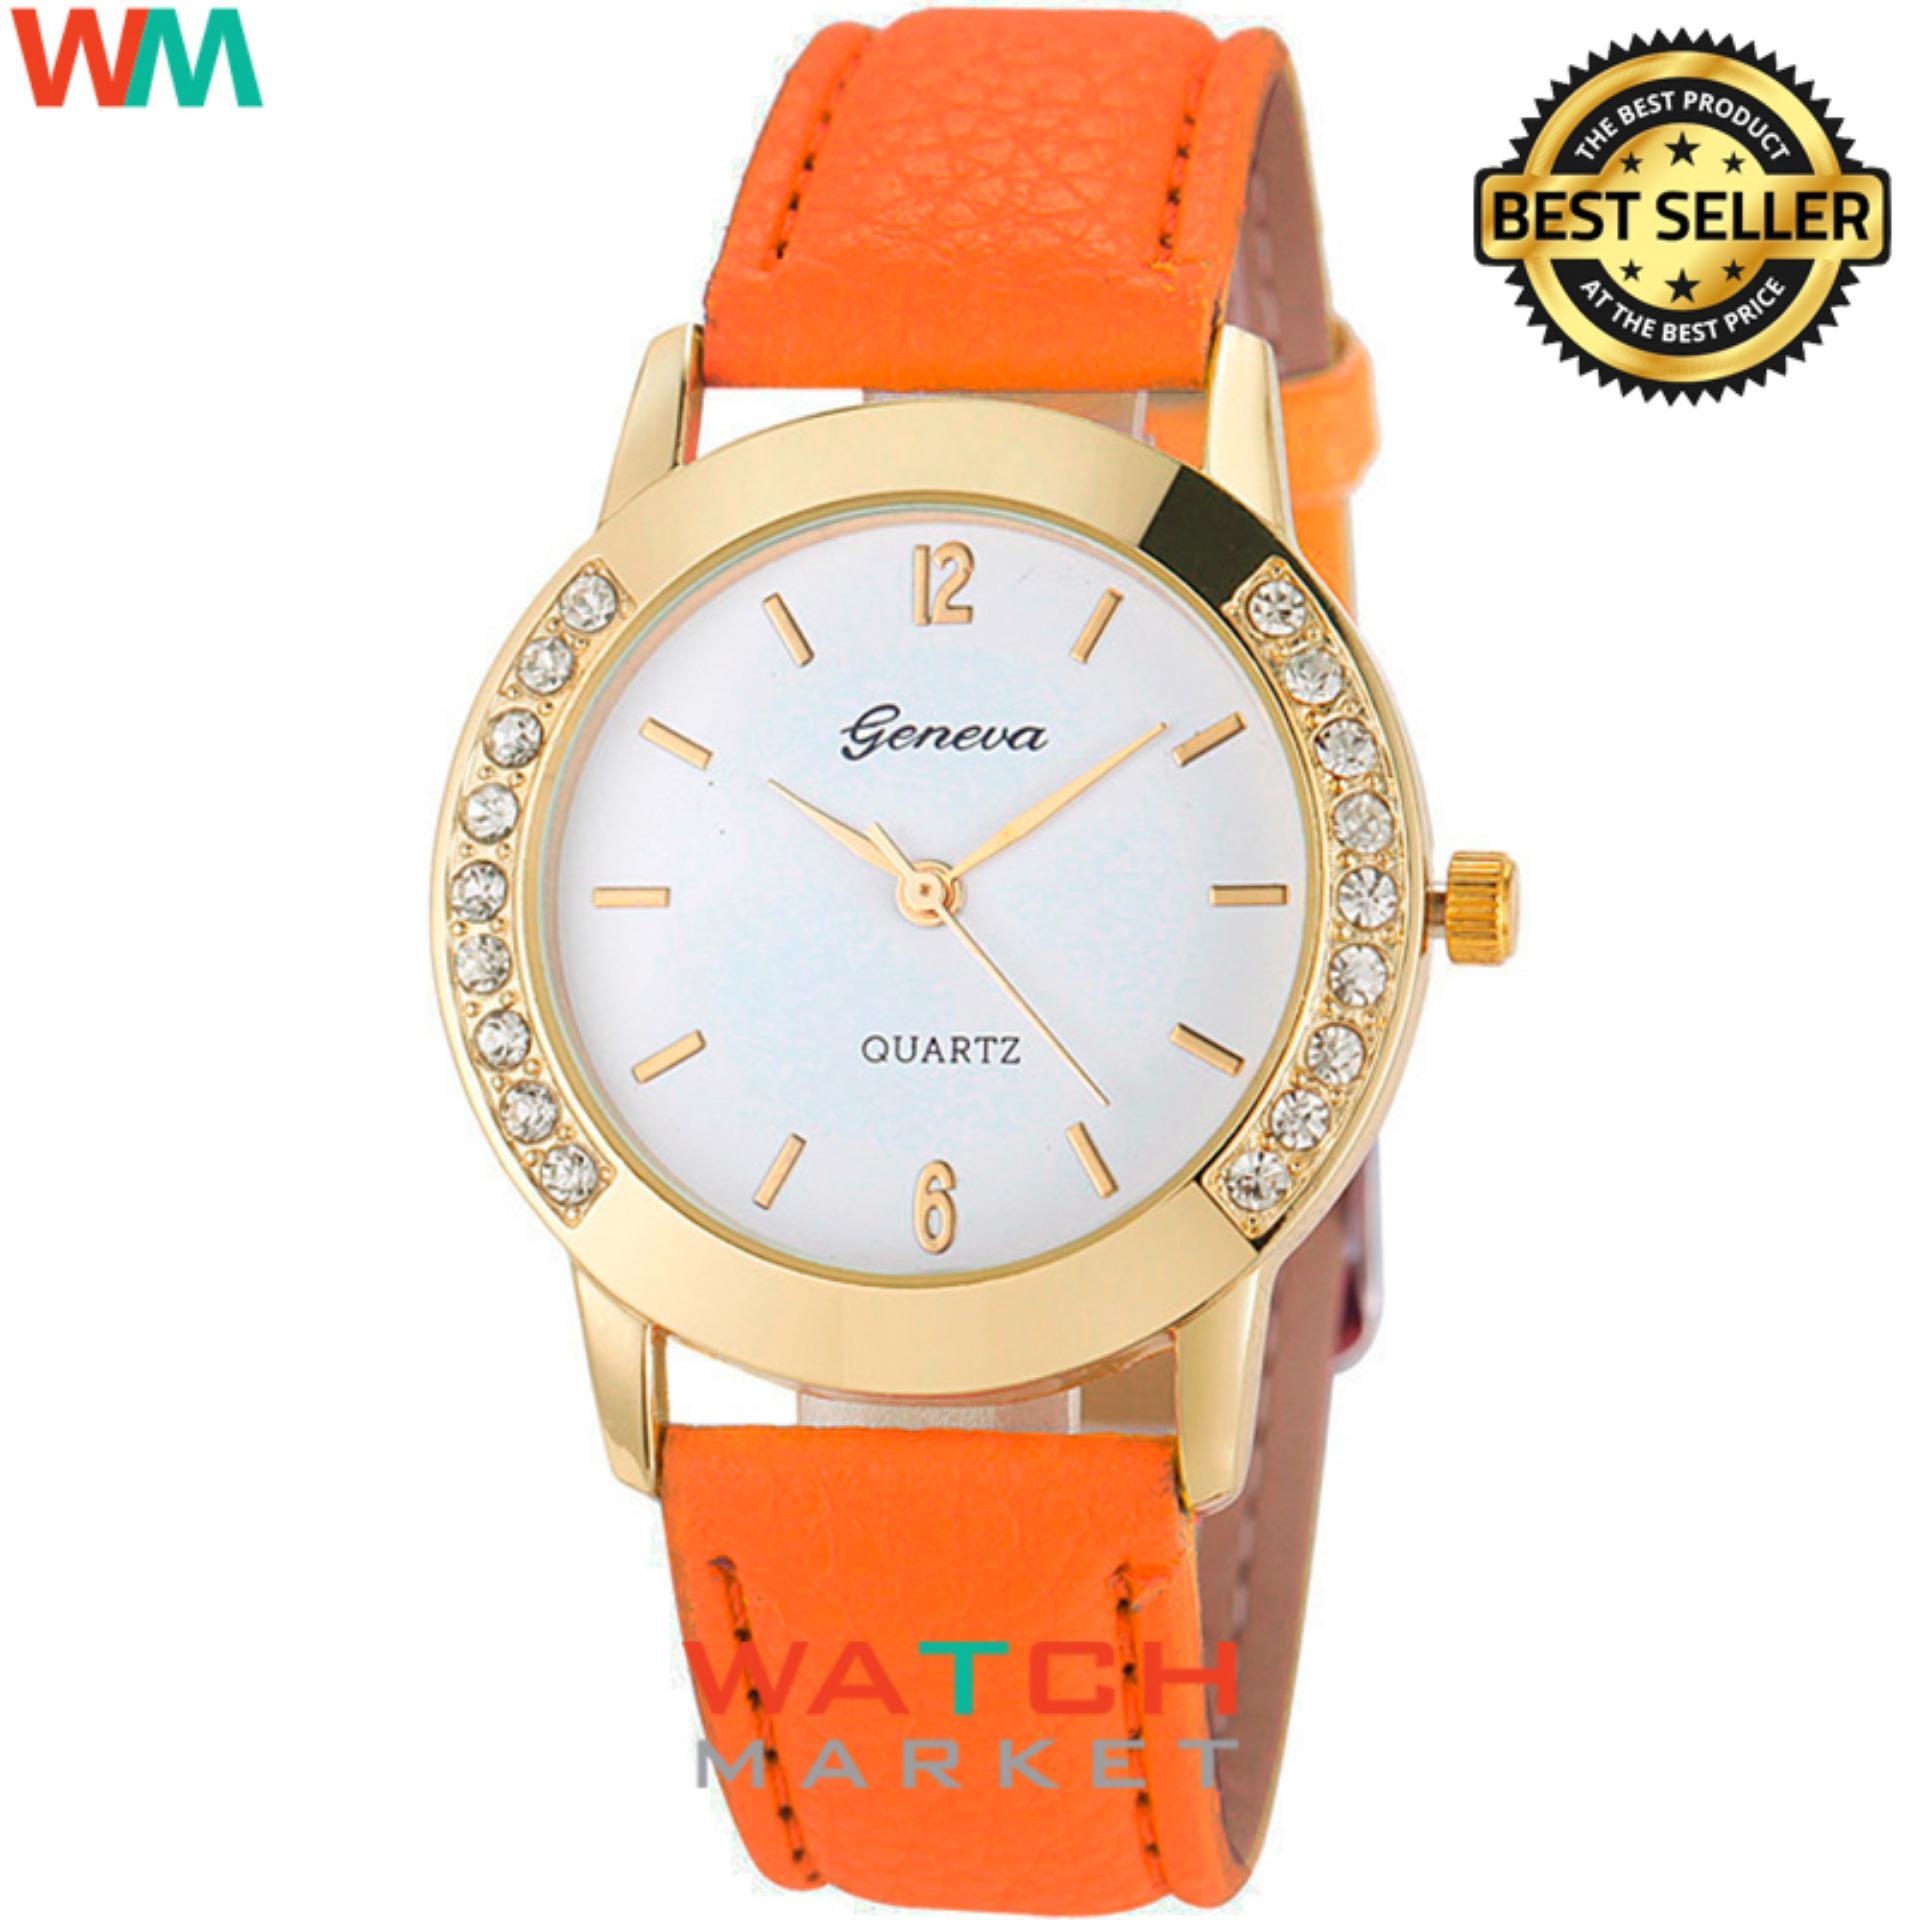 Shock Price Geneva - Jam Tangan Wanita - Orange Gold - Strap Leather - 003  best price - Hanya Rp21.323 ce6e063f53